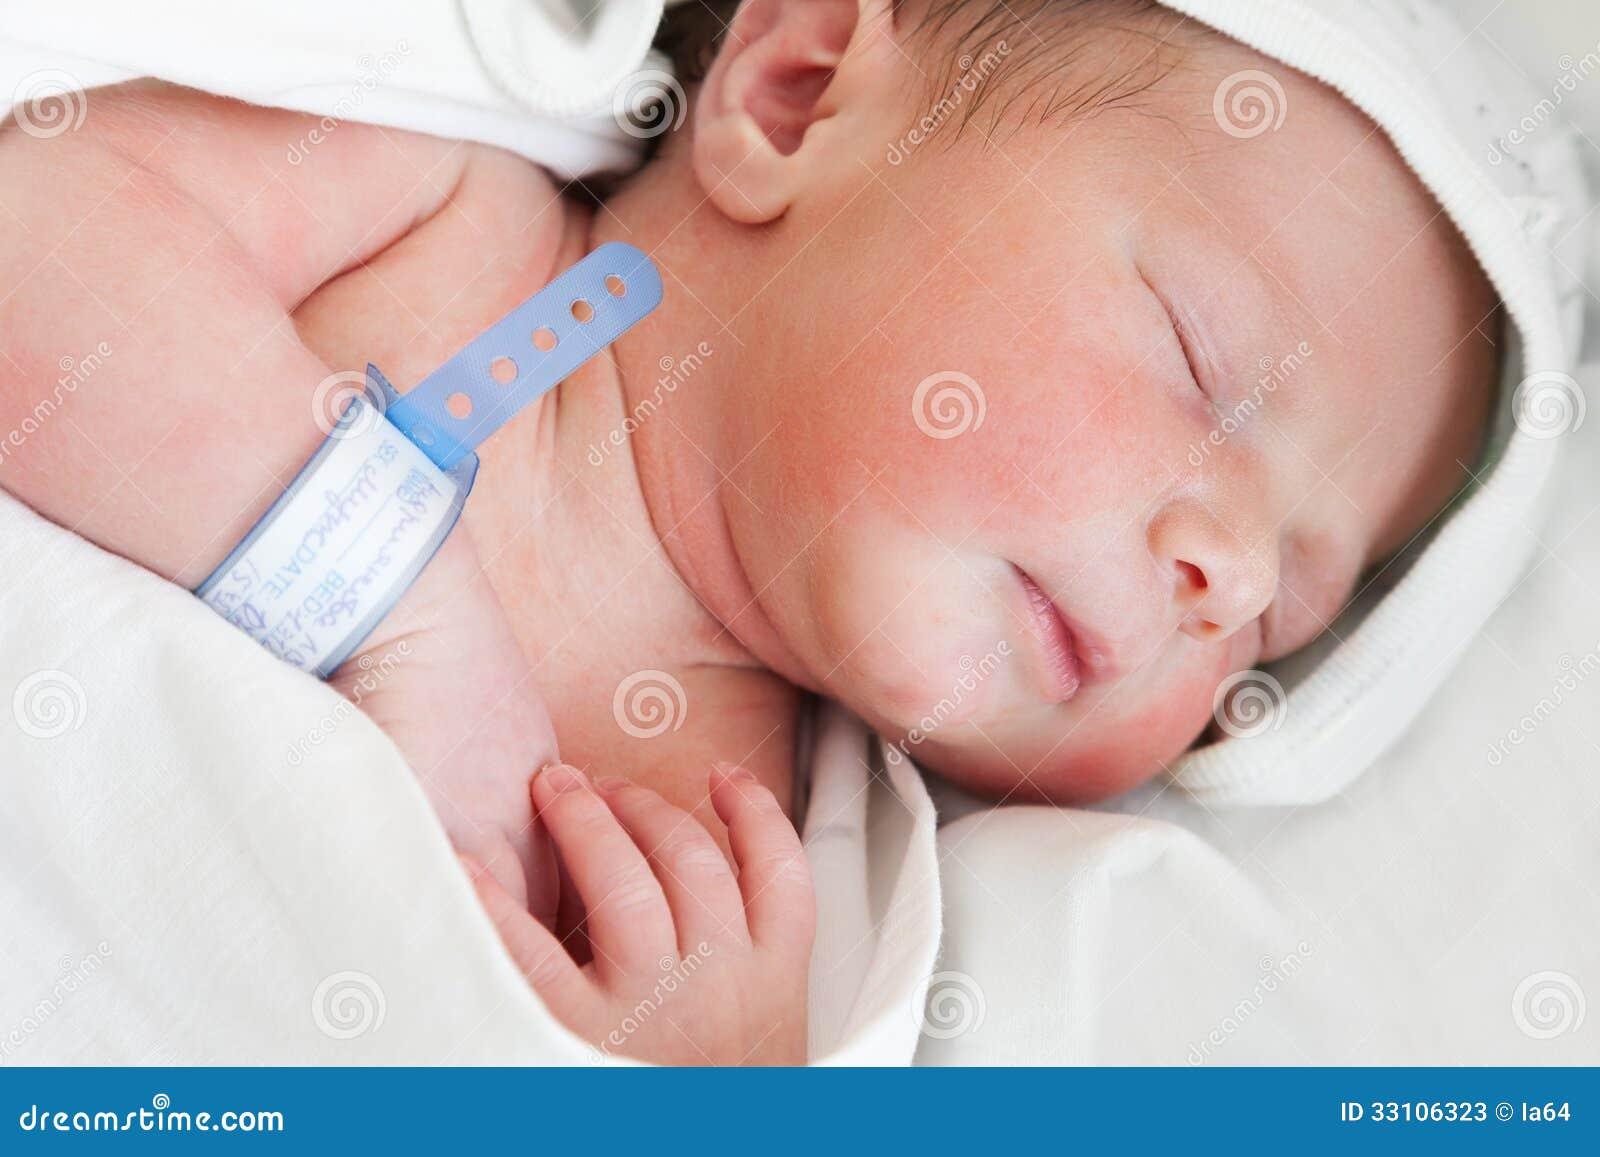 little cute newborn baby child sleeping stock image - image of human